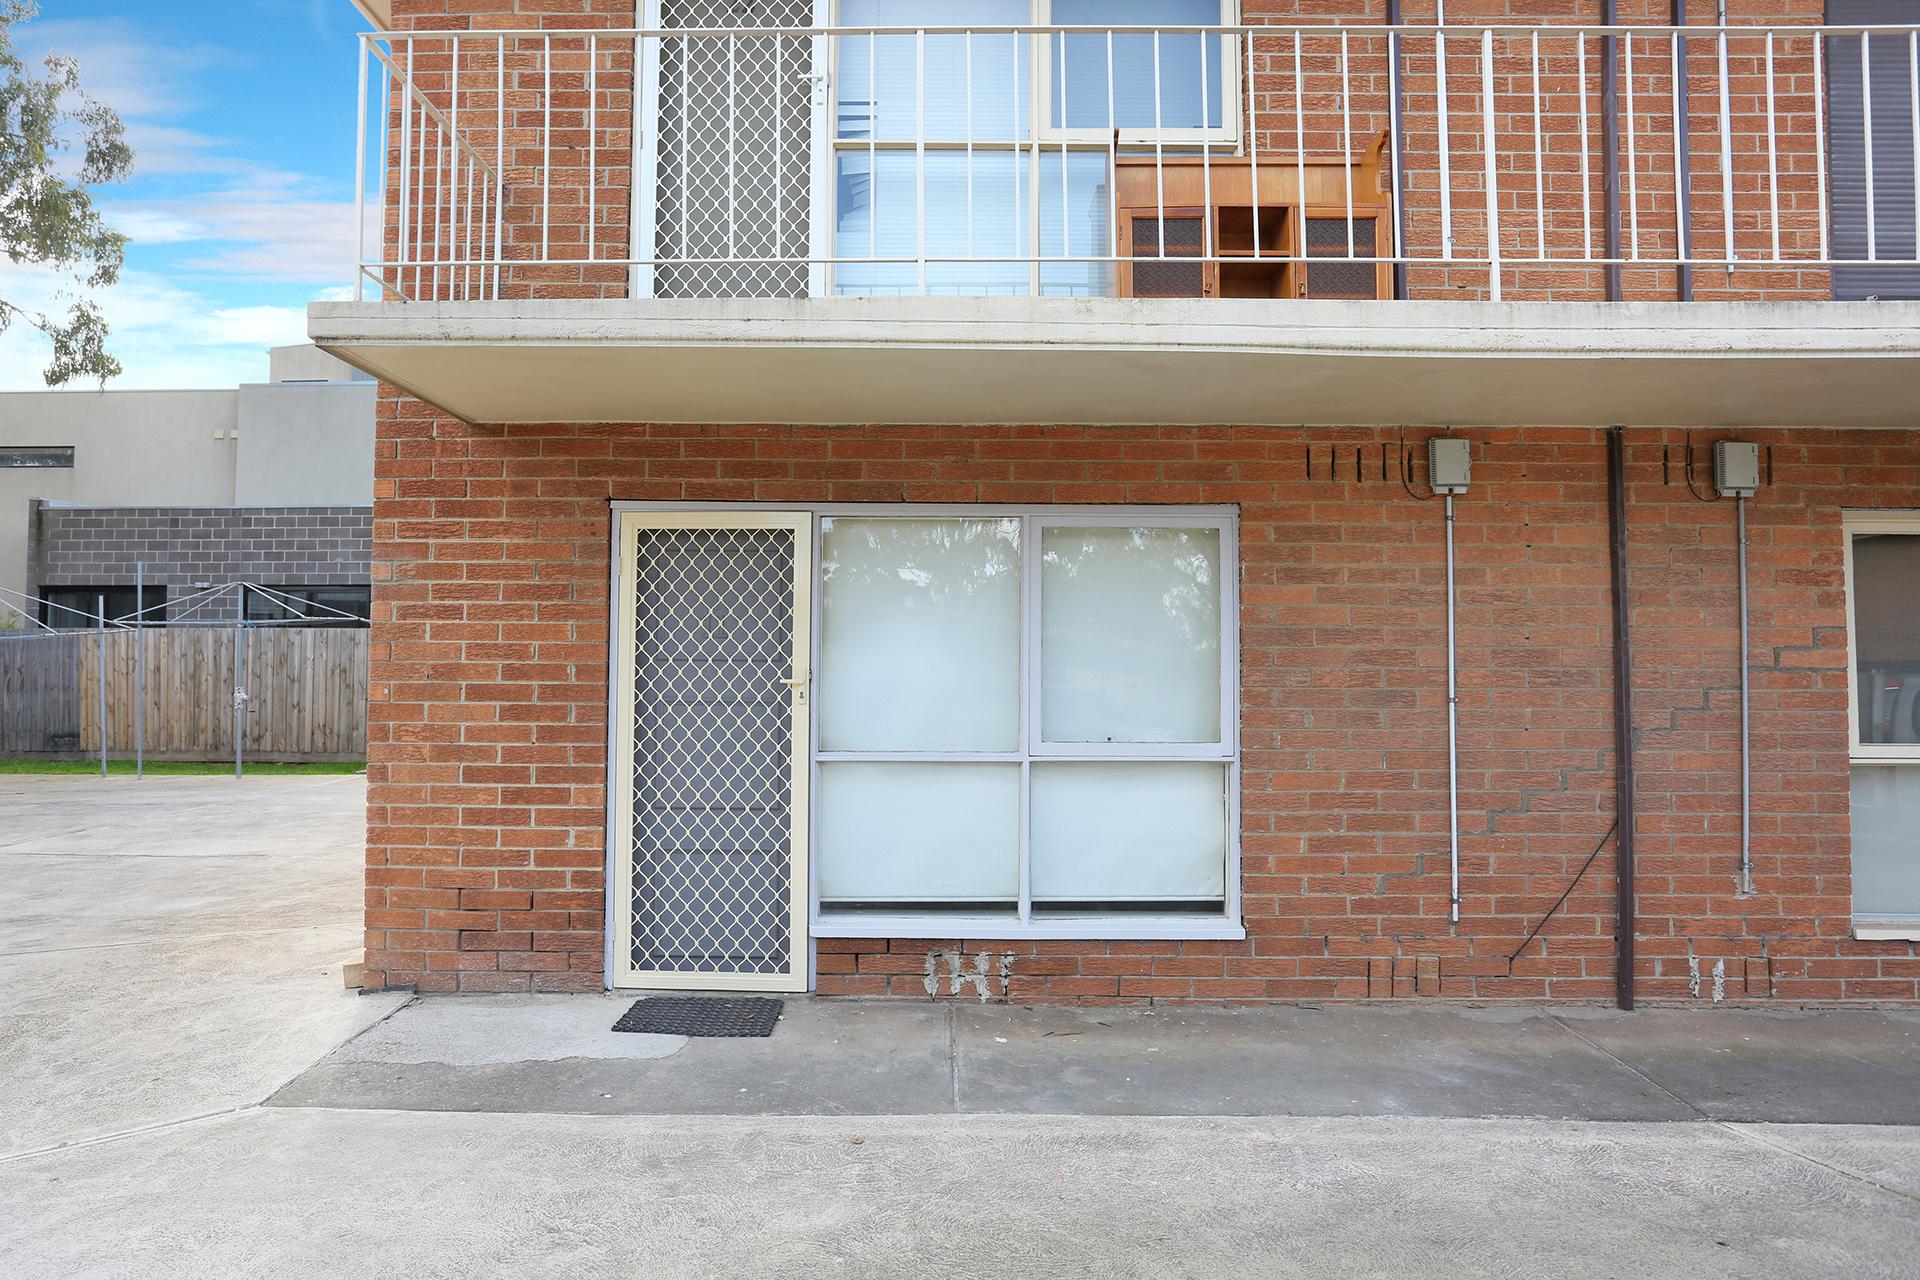 LowRes 3728 11 1 Hatfield Court West Footscray2245429 122EOS5D 288